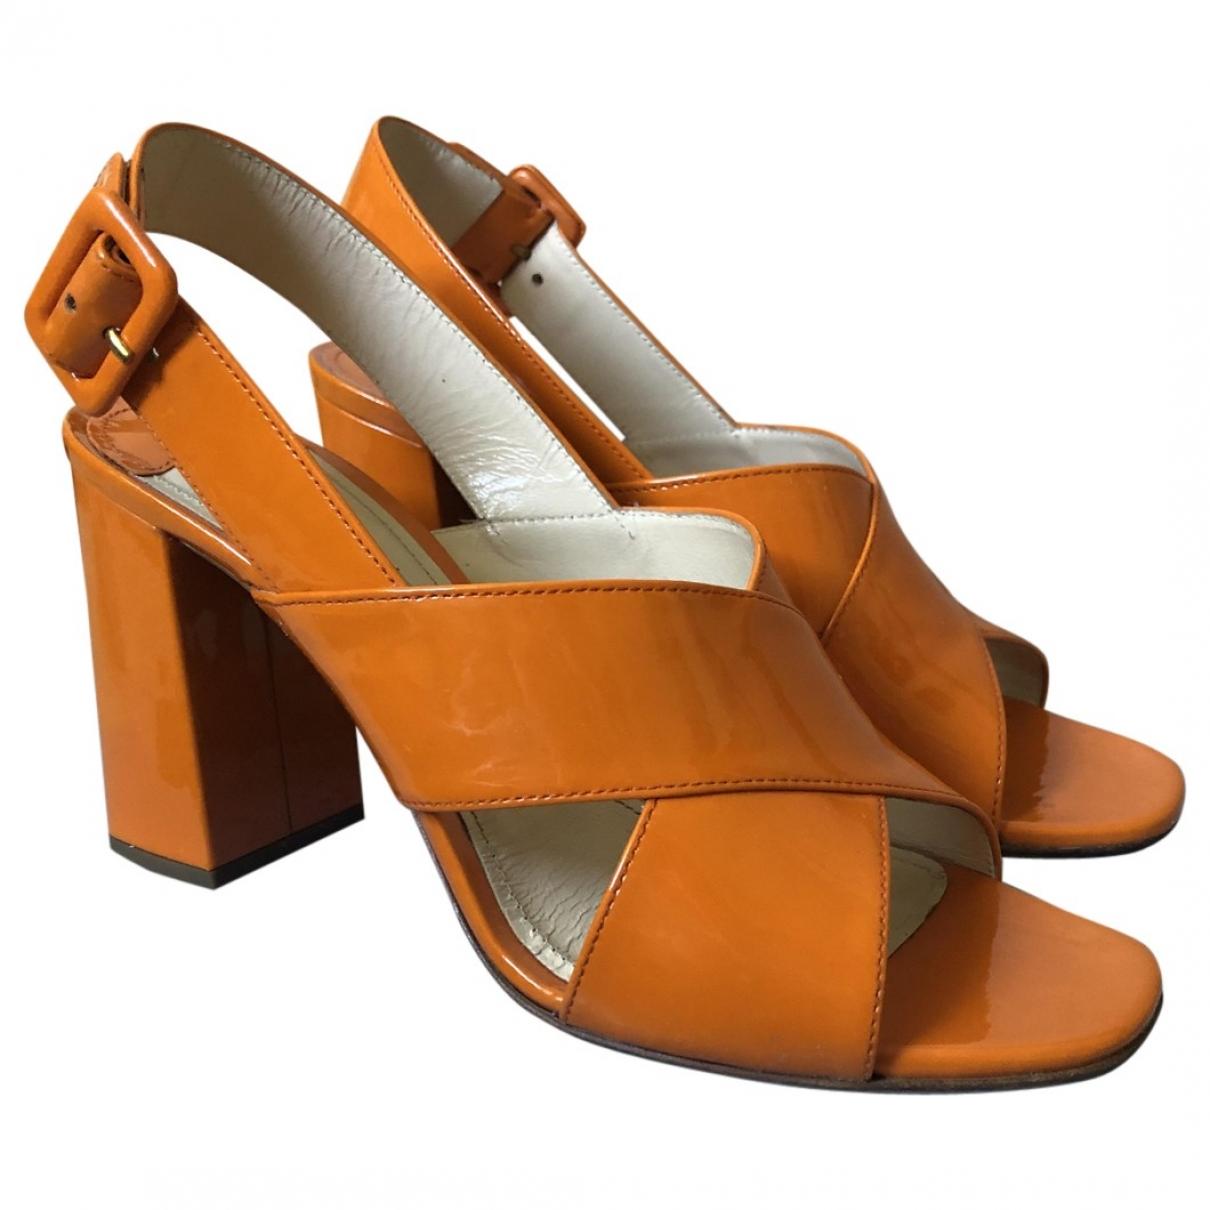 Prada \N Orange Patent leather Sandals for Women 37.5 EU